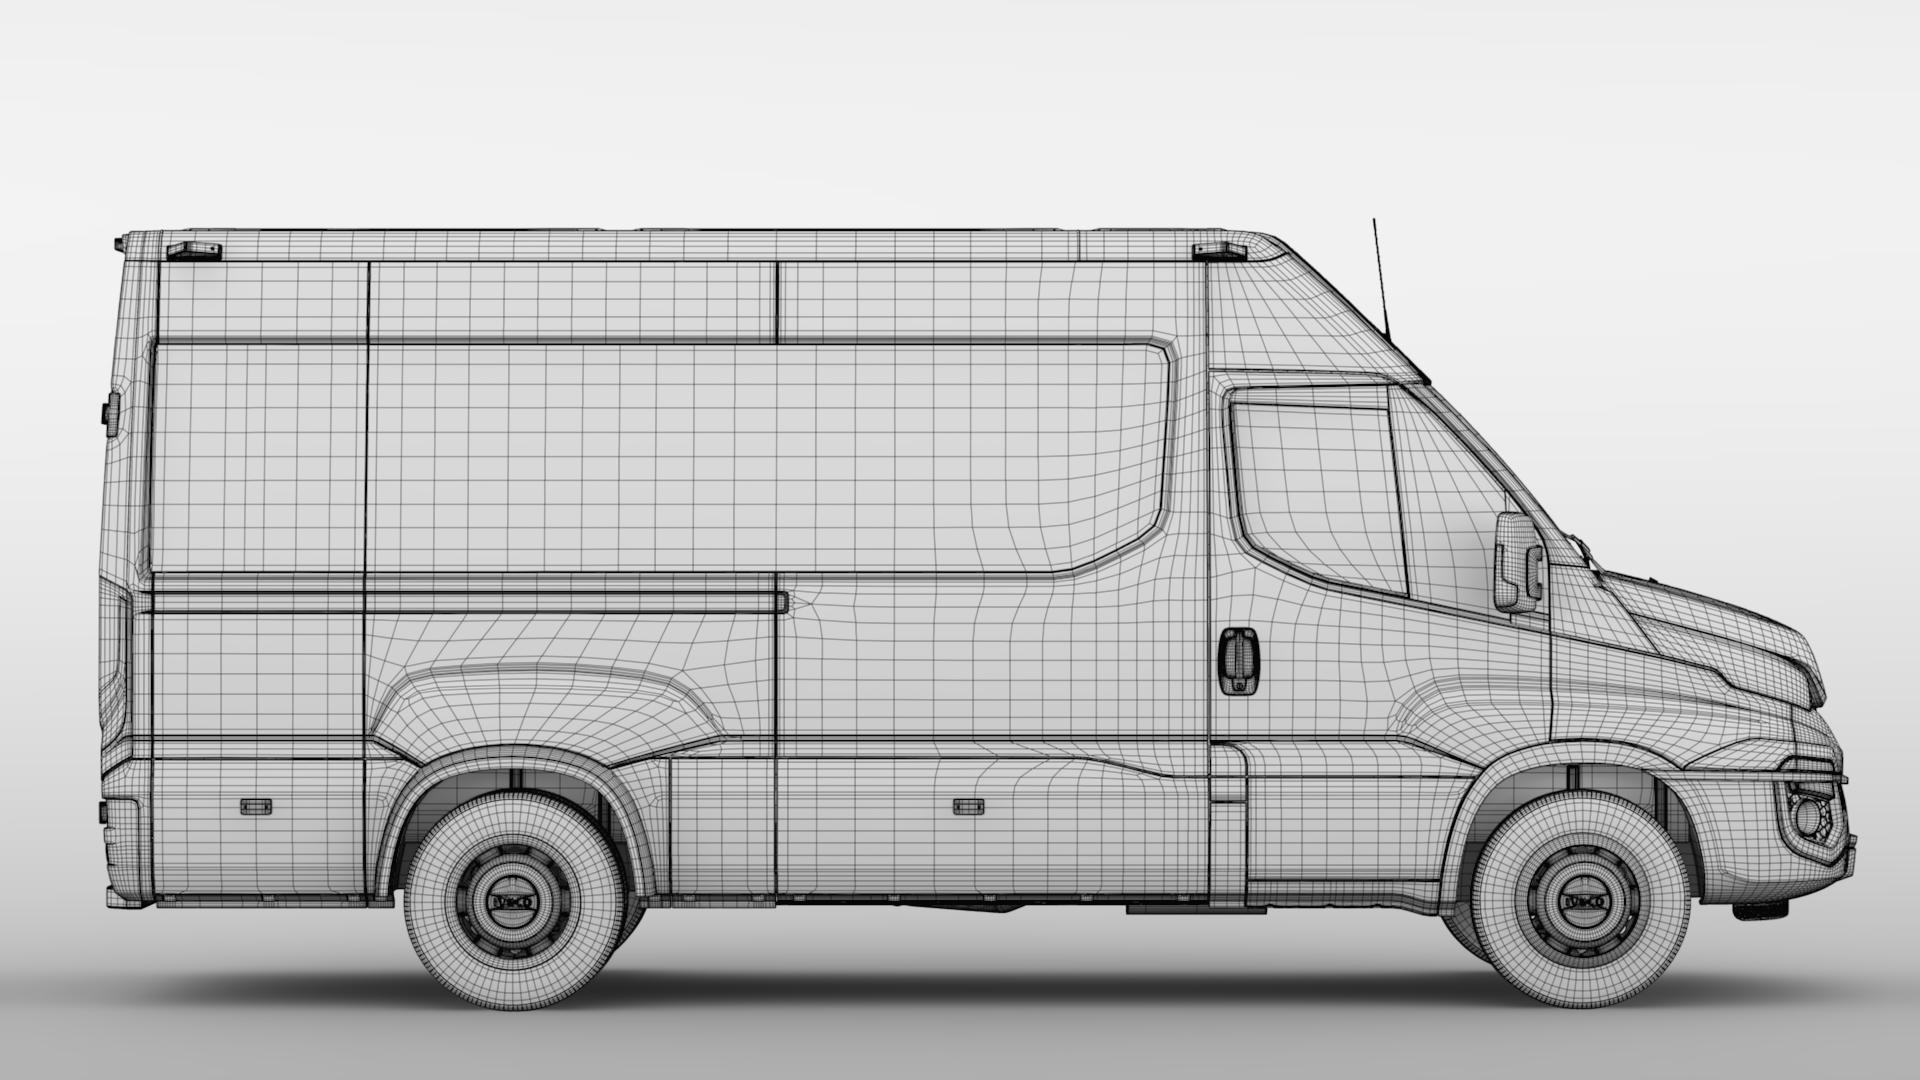 iveco daily minibus l3h2 2014-2016 3d model max fbx c4d lwo ma mb hrc xsi obj 276057